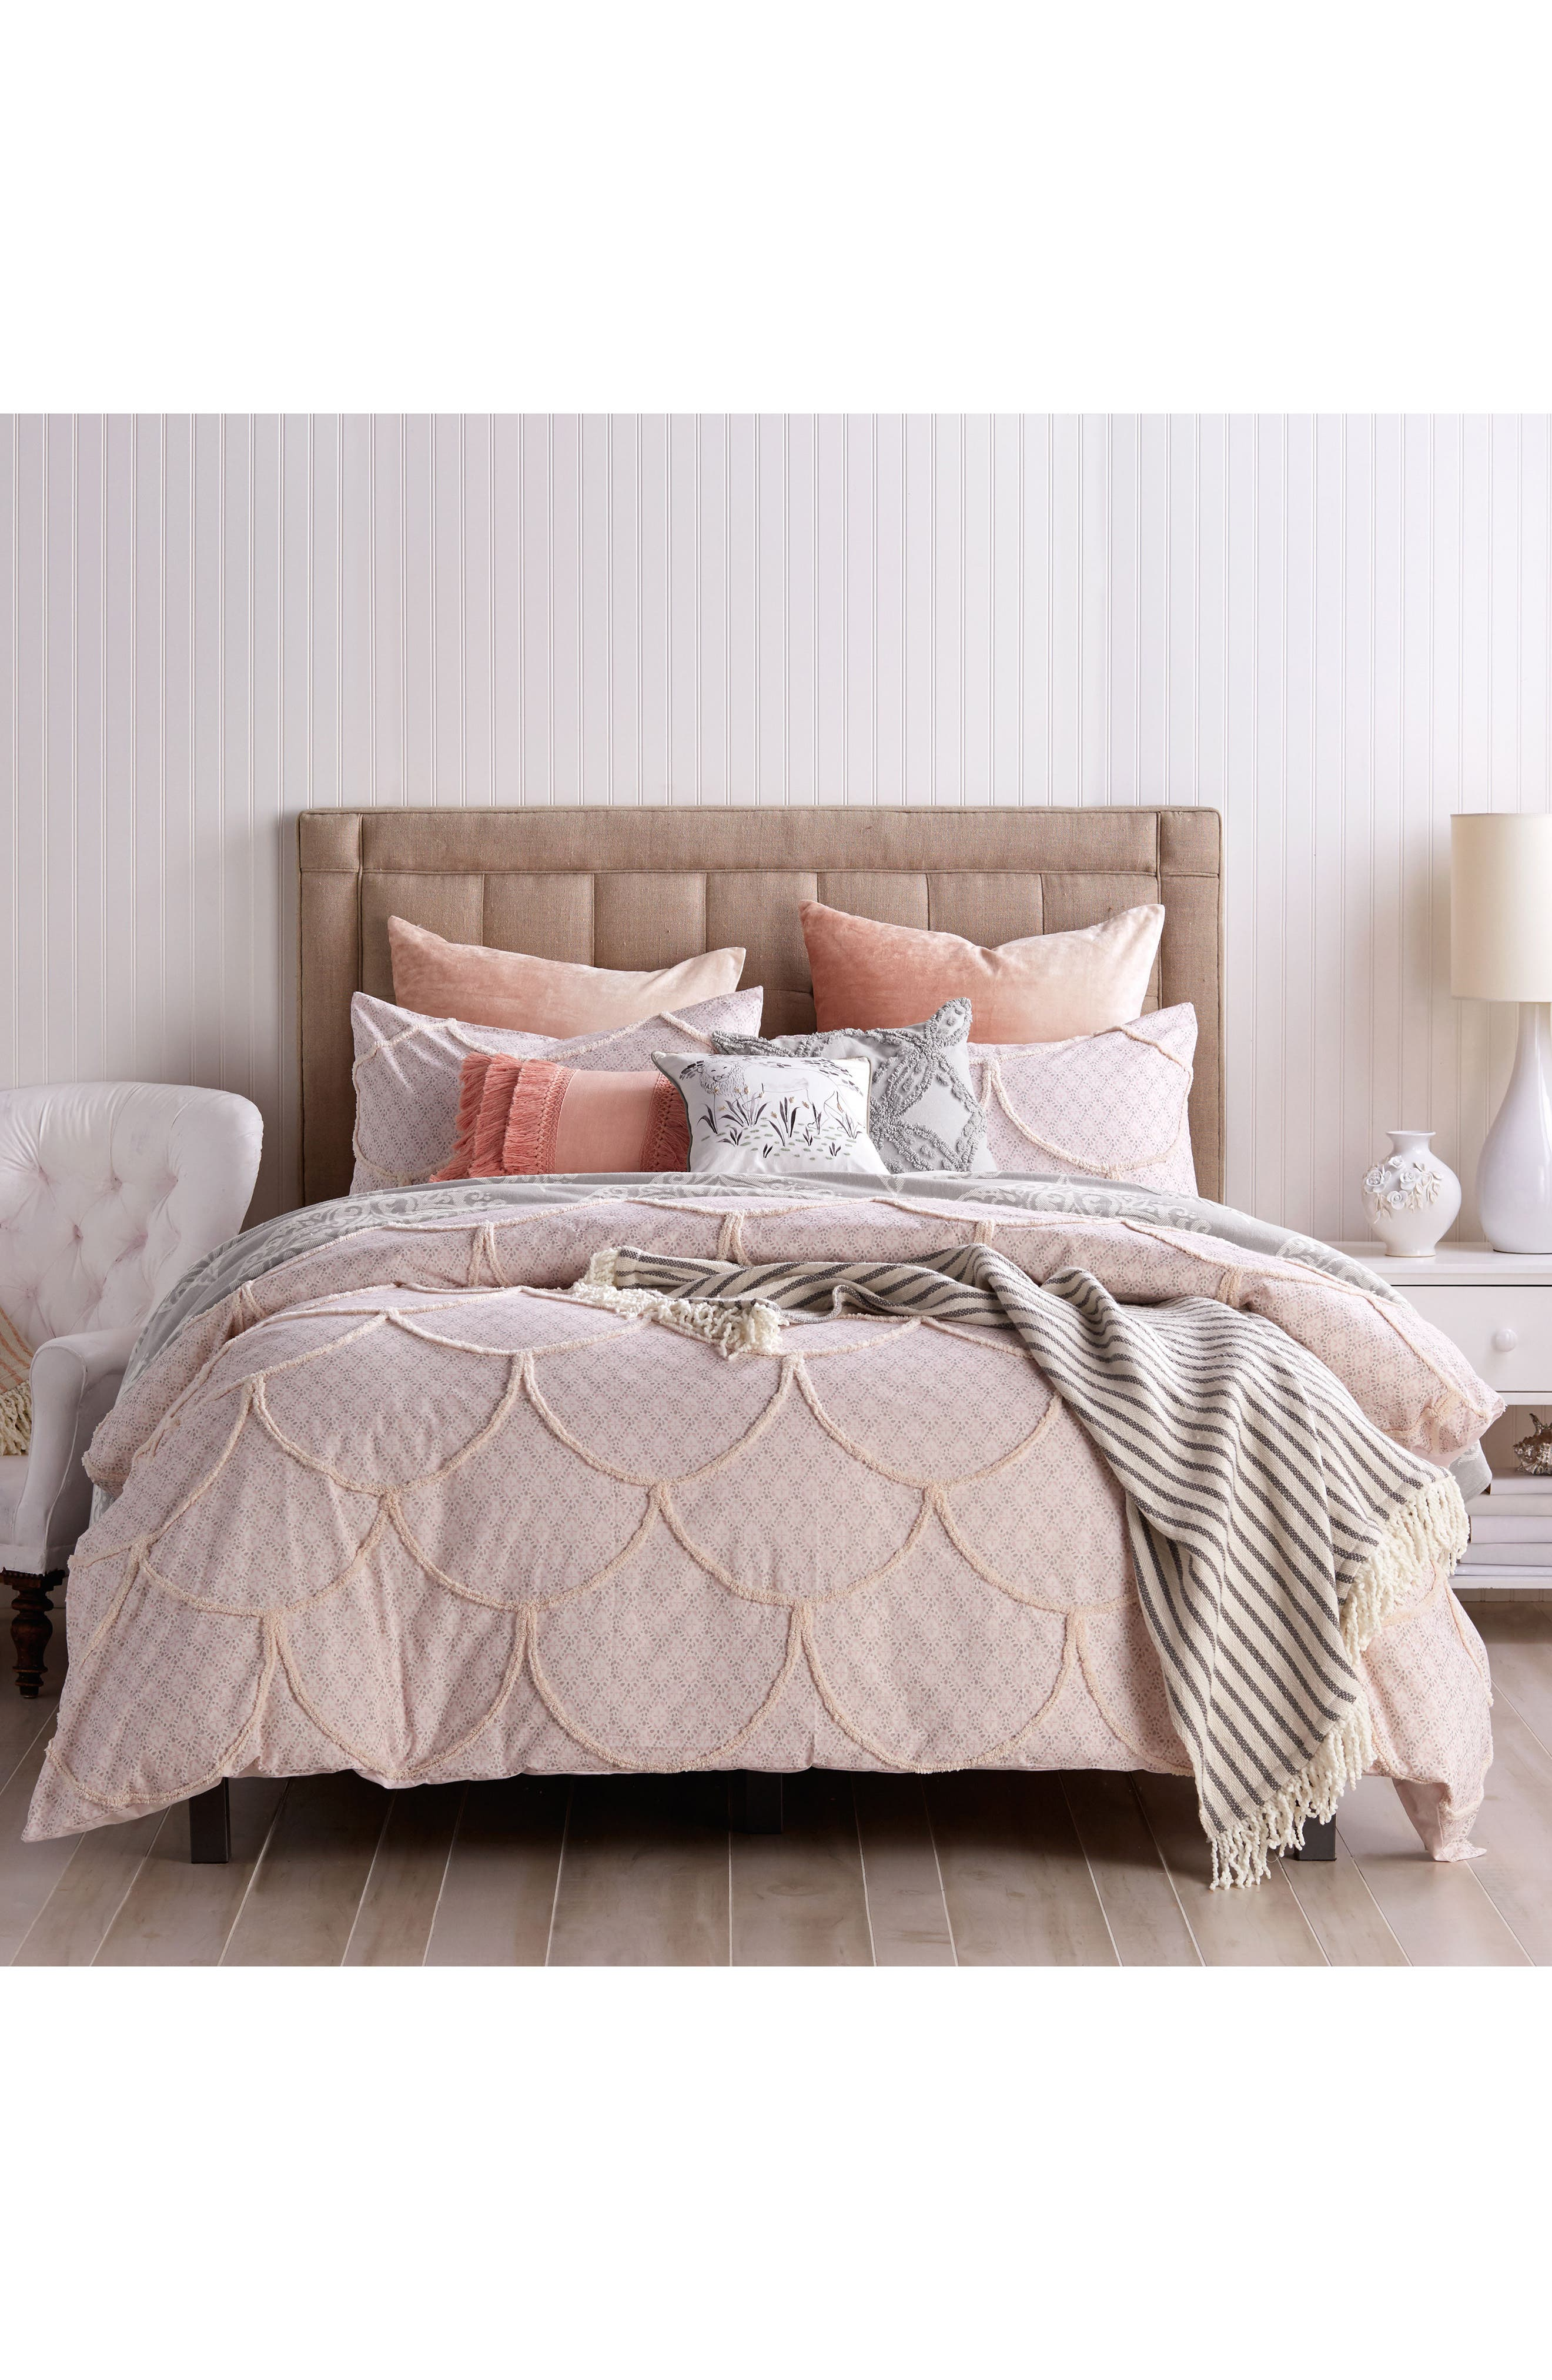 Chenille Scallop Comforter & Sham Set,                             Main thumbnail 1, color,                             650